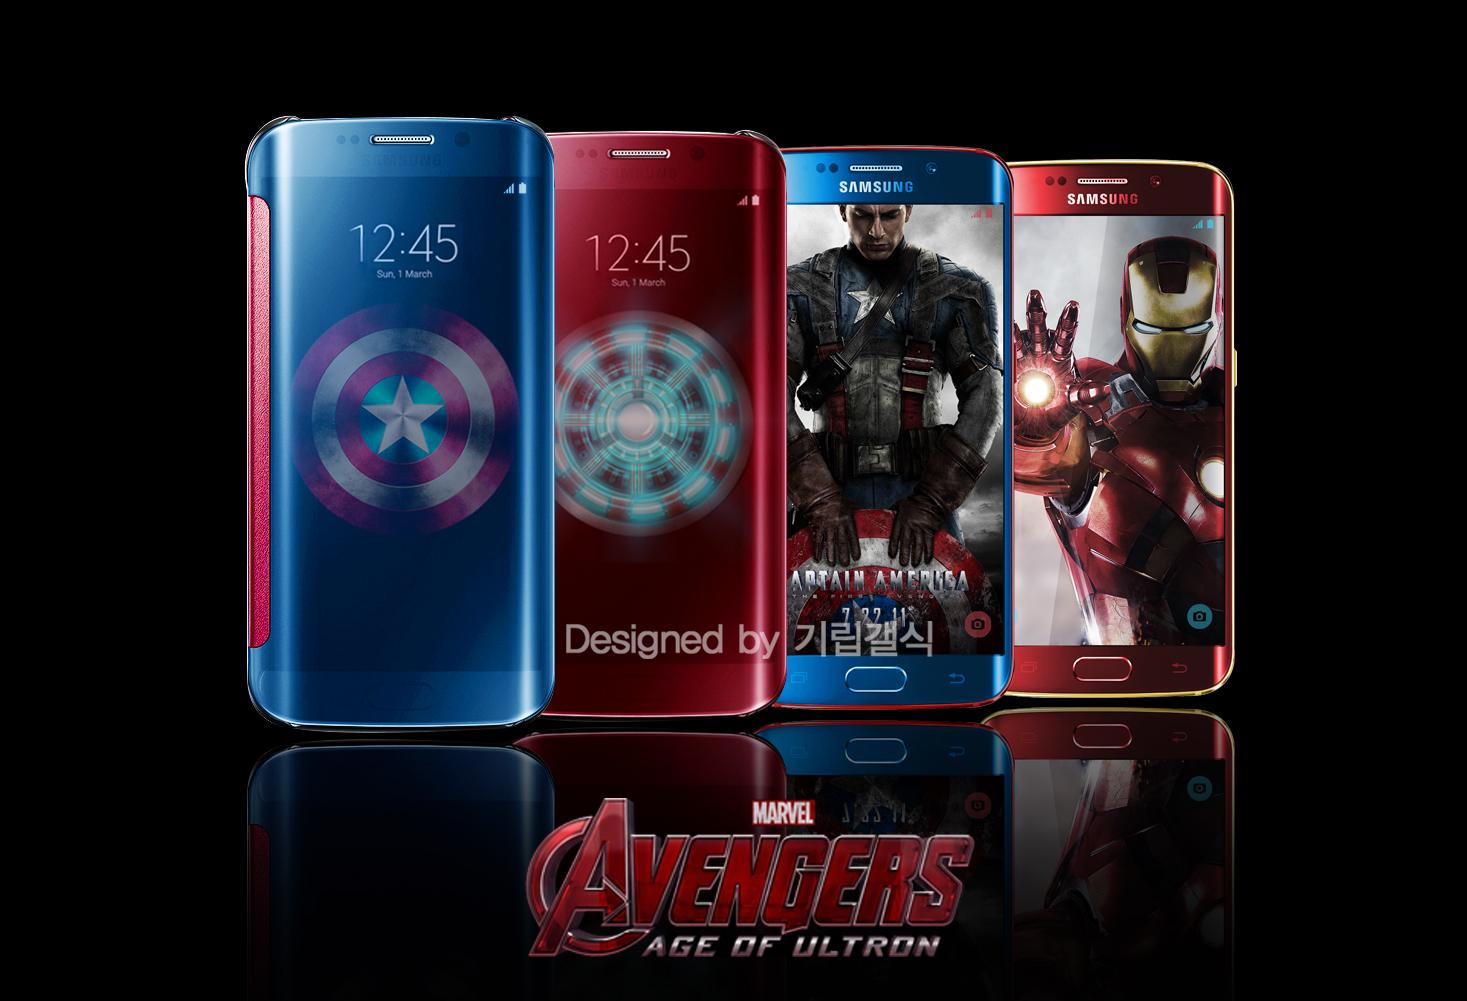 Galaxy-S6-Avengers-9